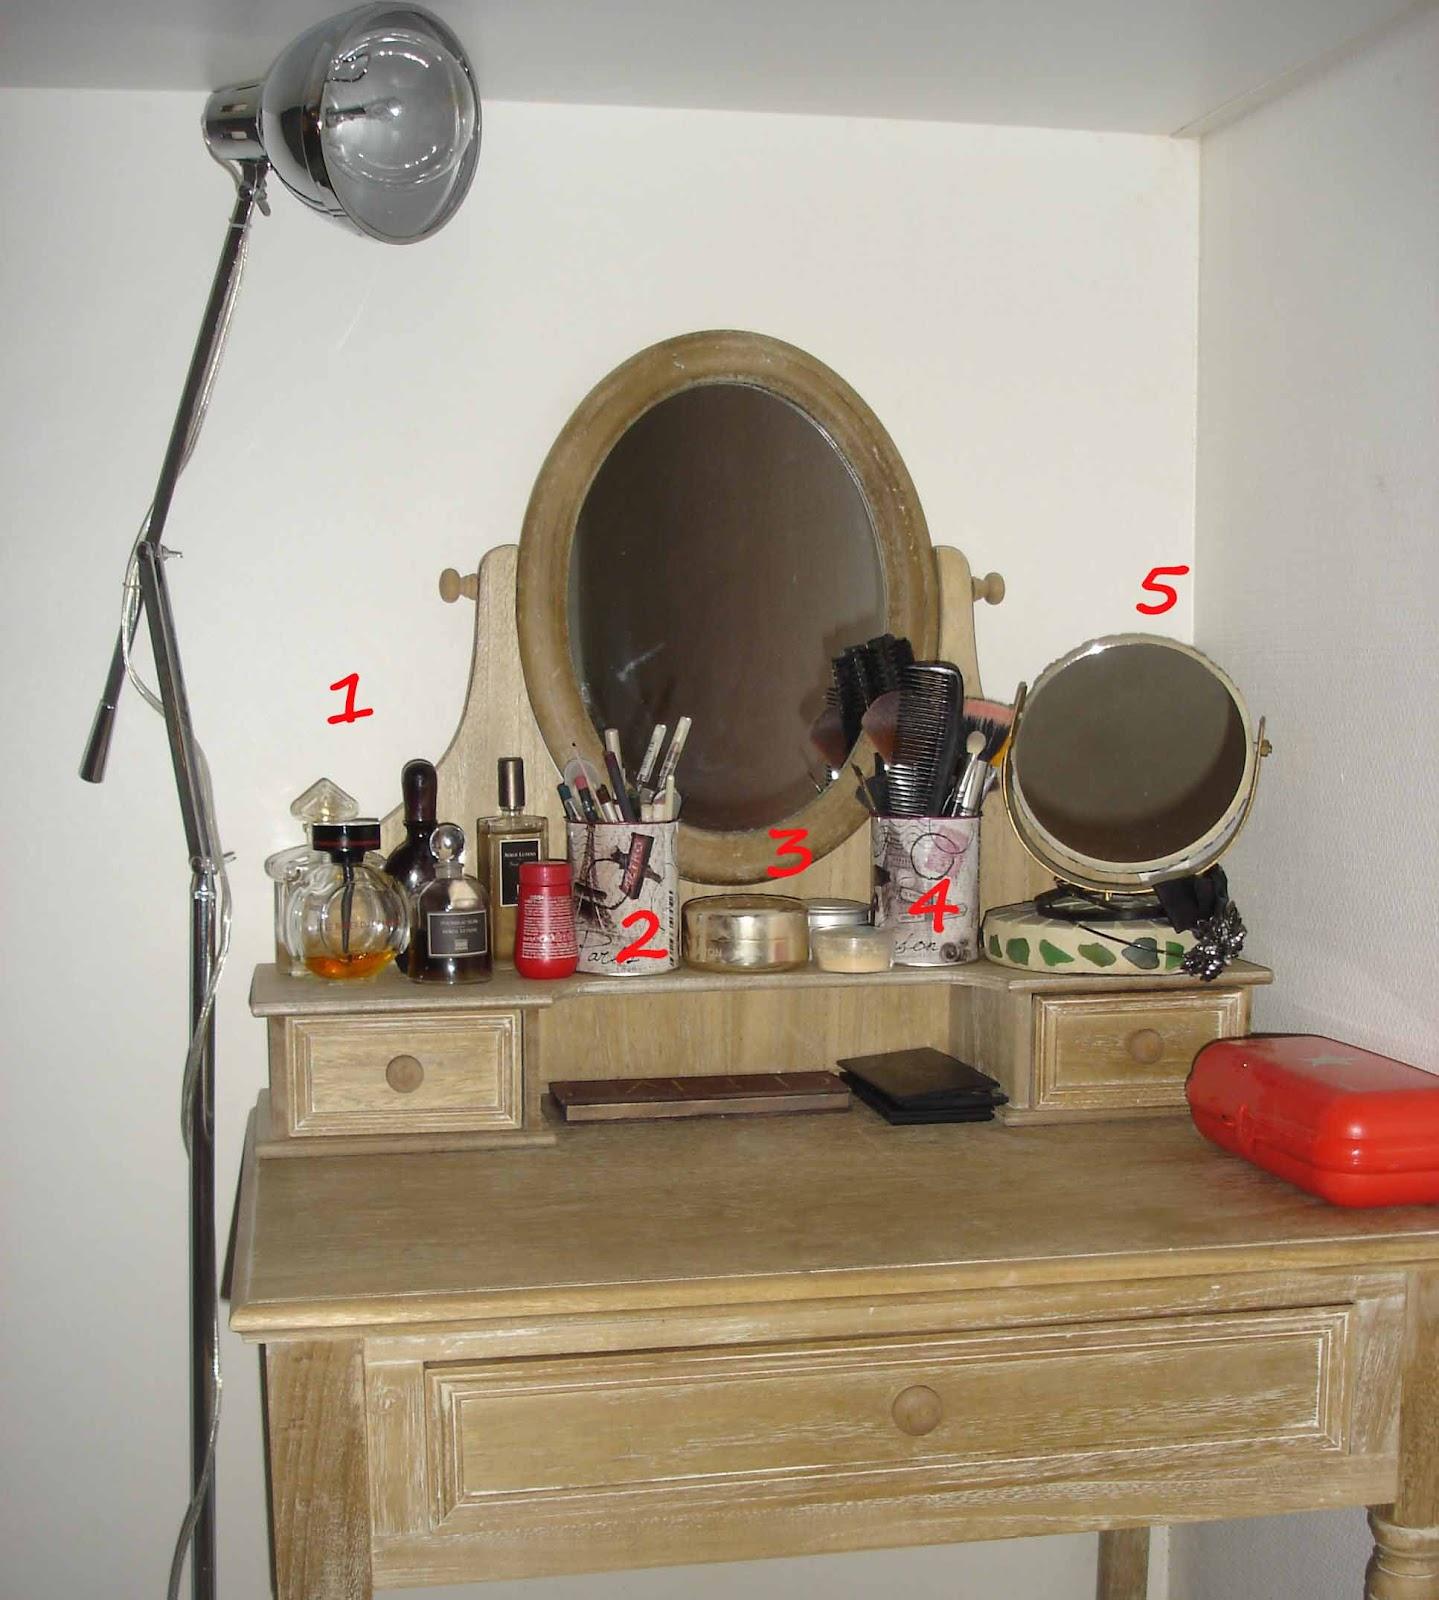 instant de fille ma coiffeuse ou le bordel girly. Black Bedroom Furniture Sets. Home Design Ideas